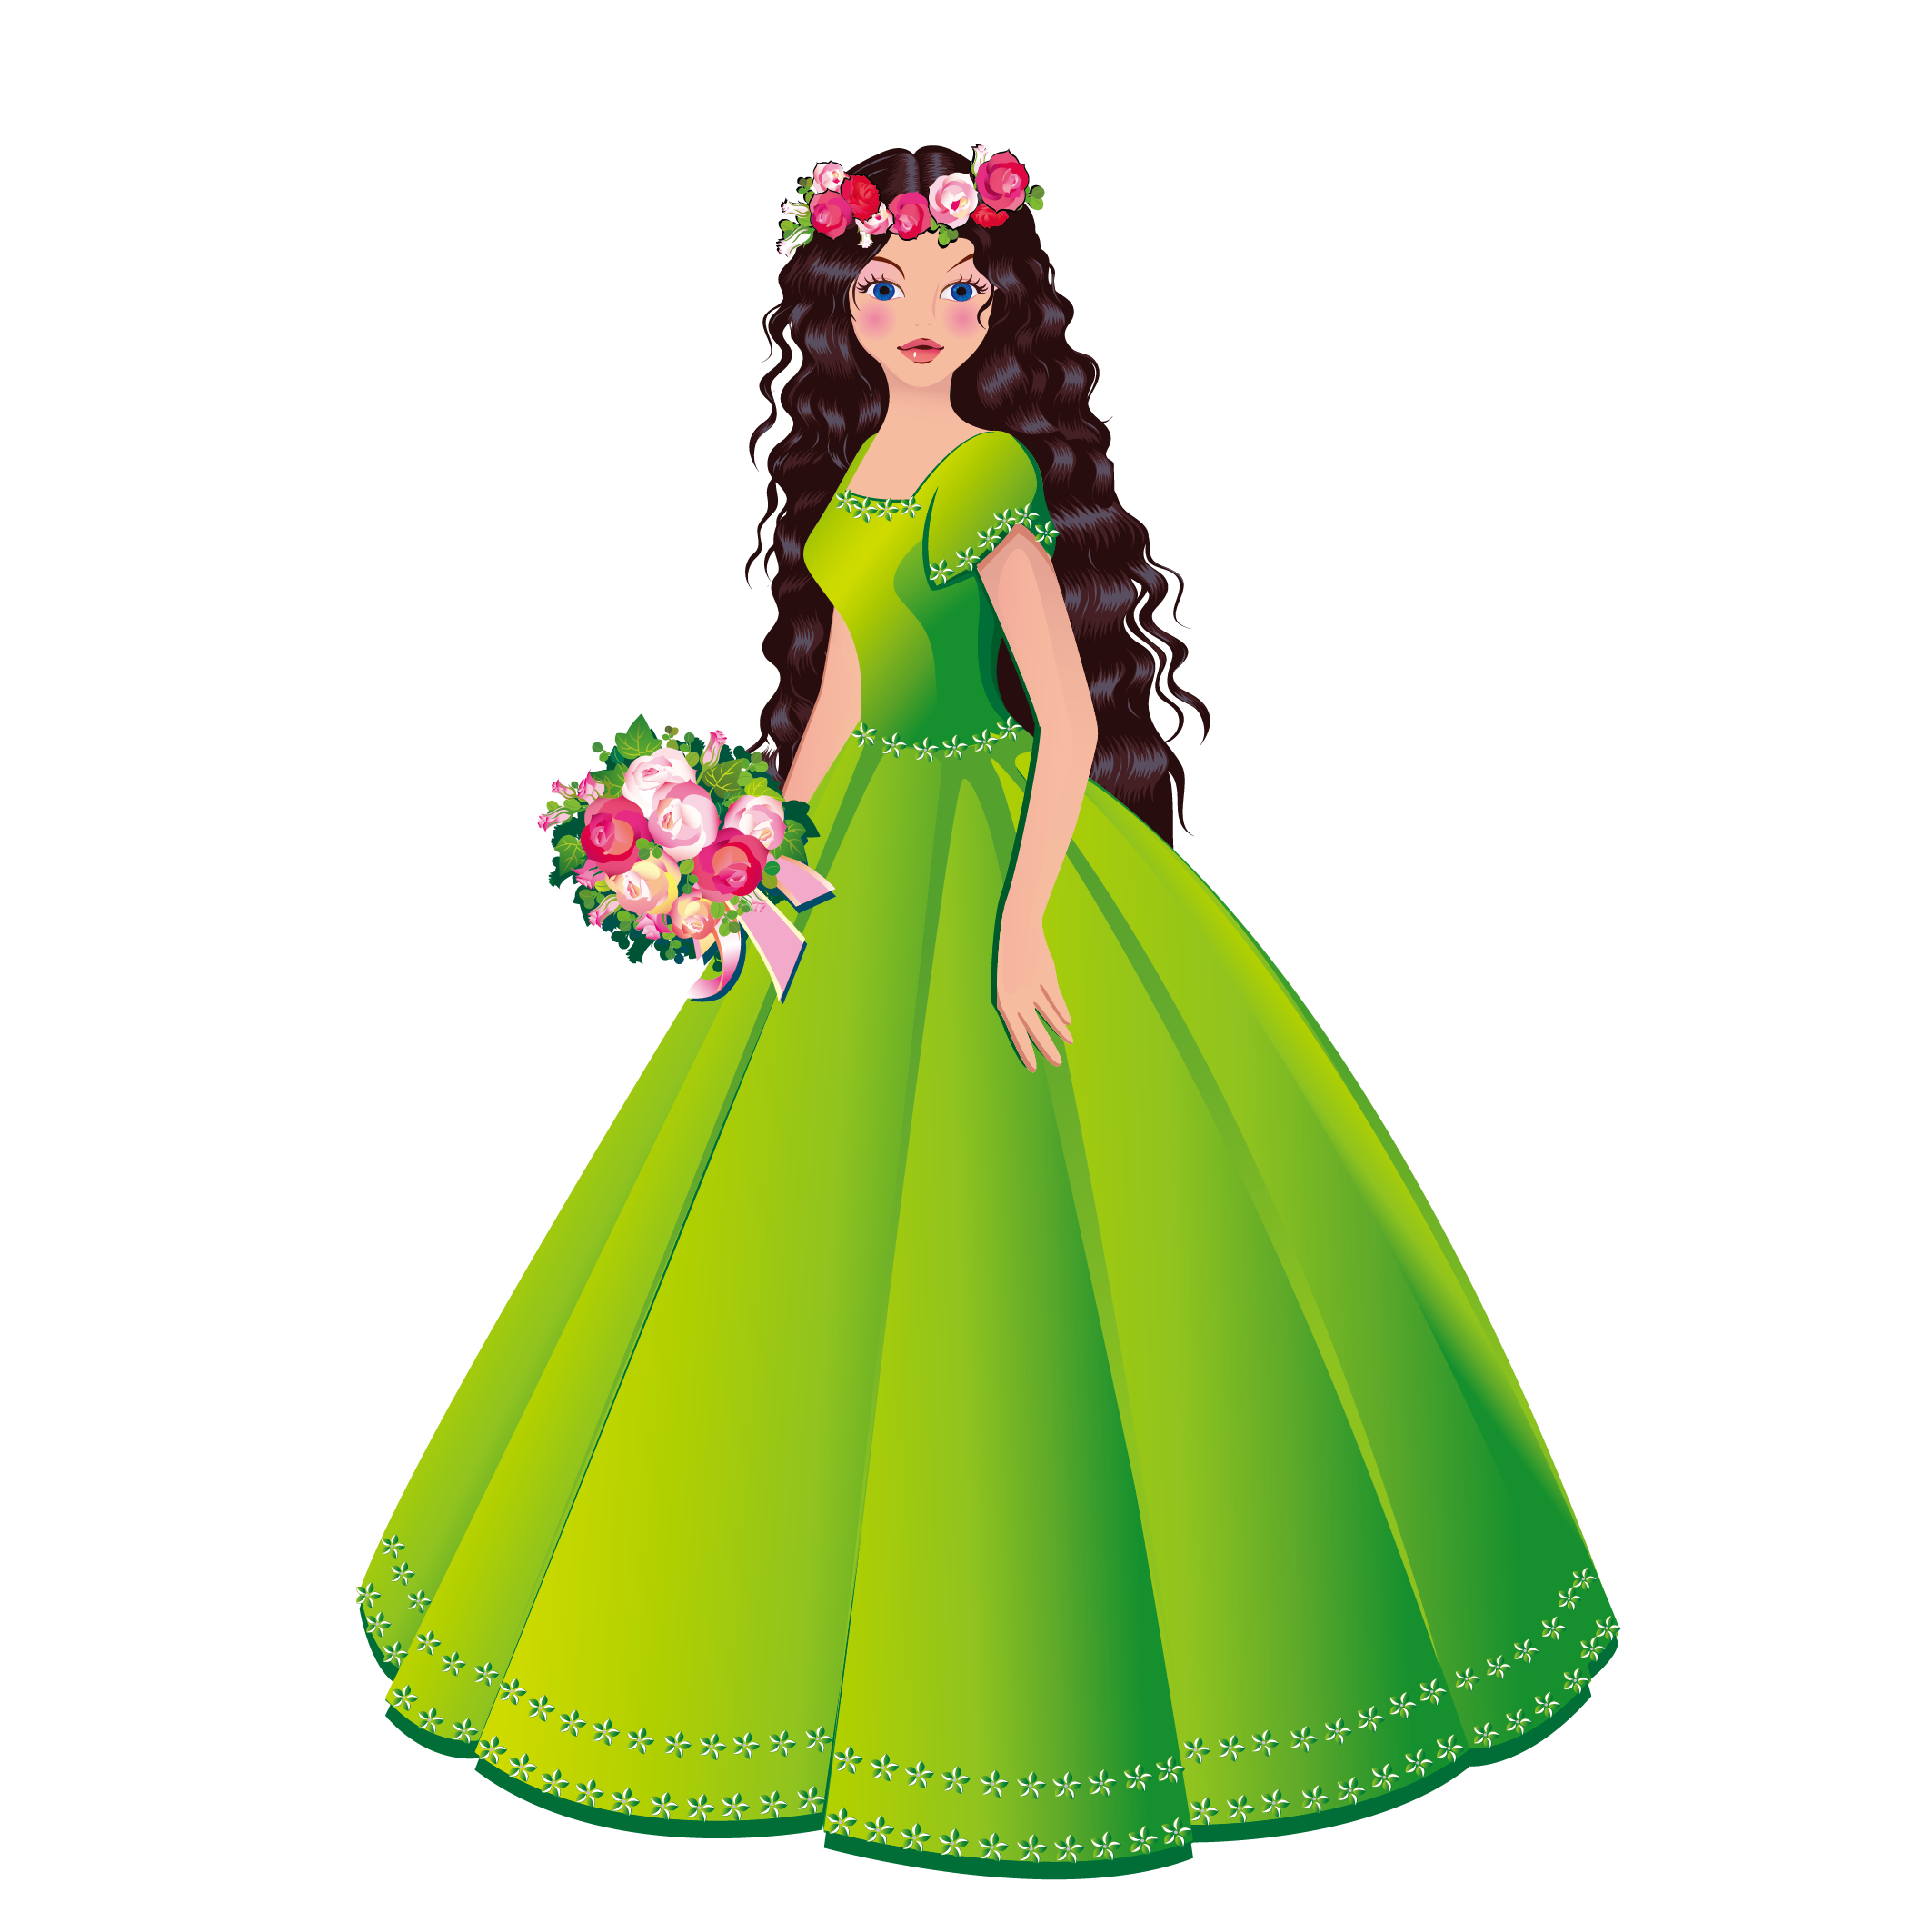 2126x2126 Princess Royalty Free Stock Photography Clip Art